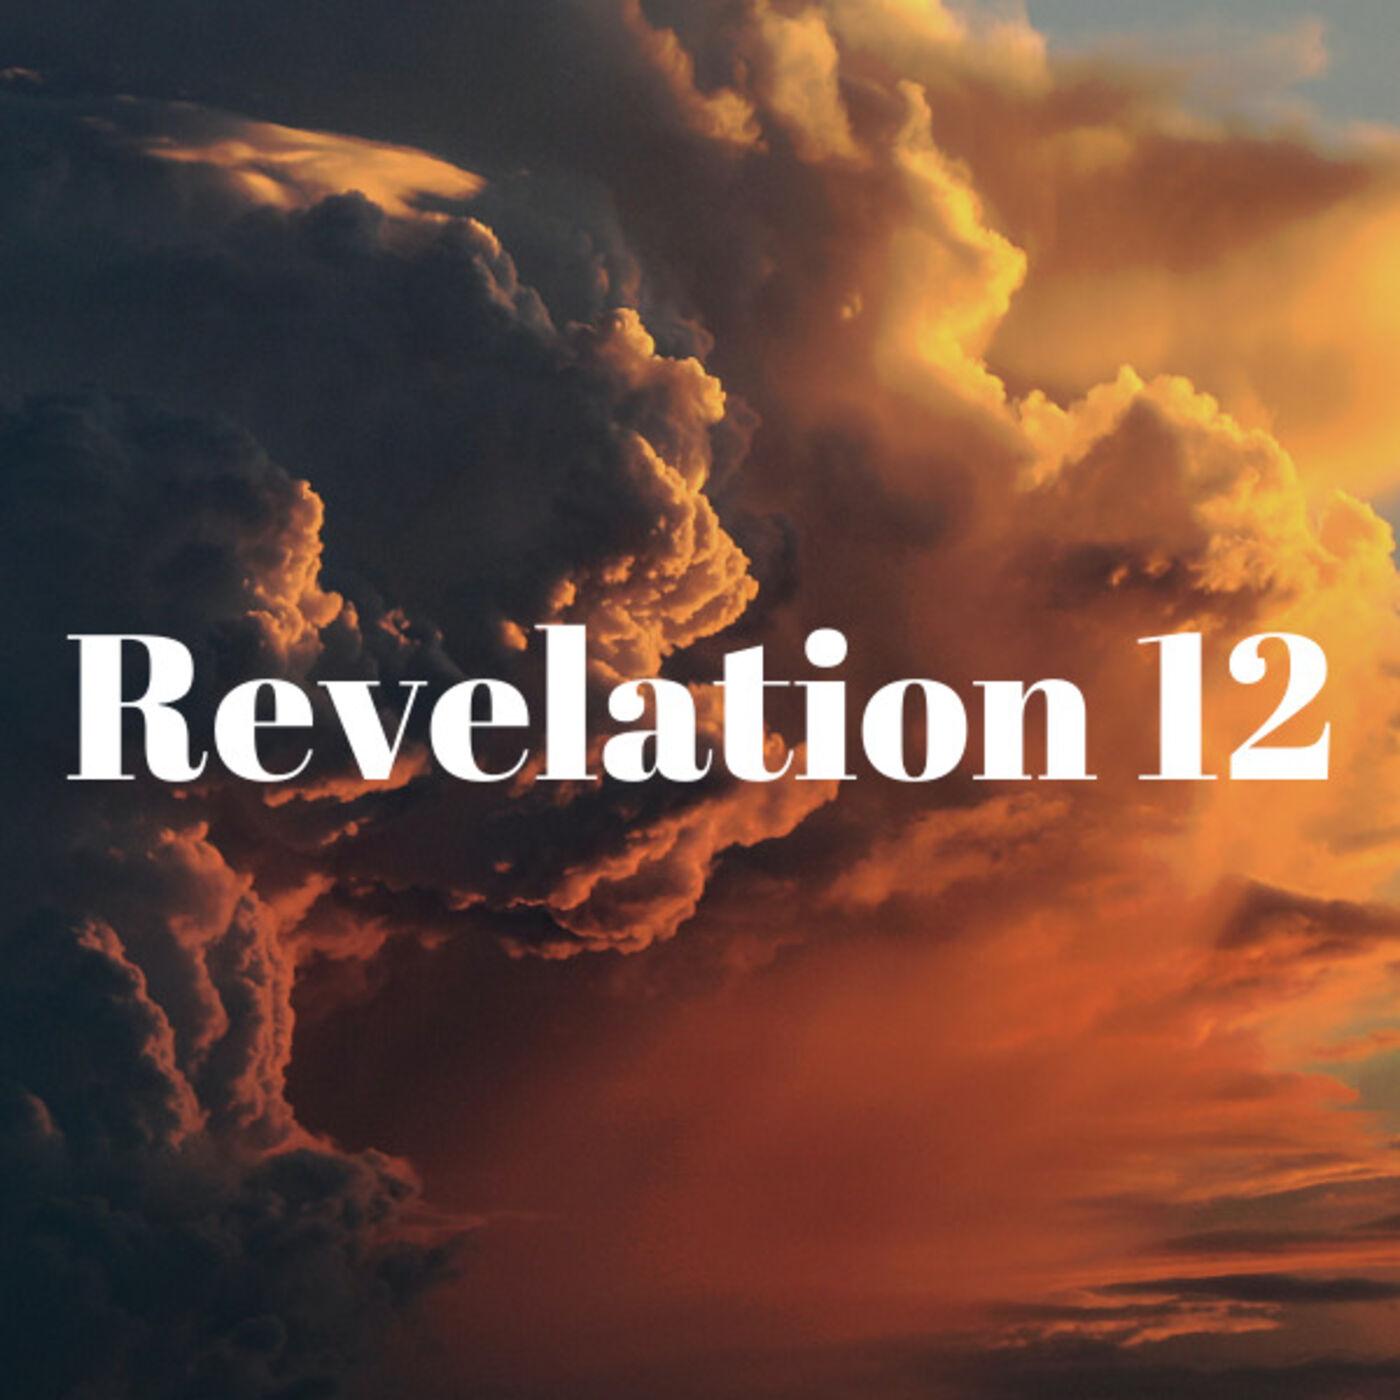 Relentless Rage Against His Church—Part 2 The Gospel Always Wins